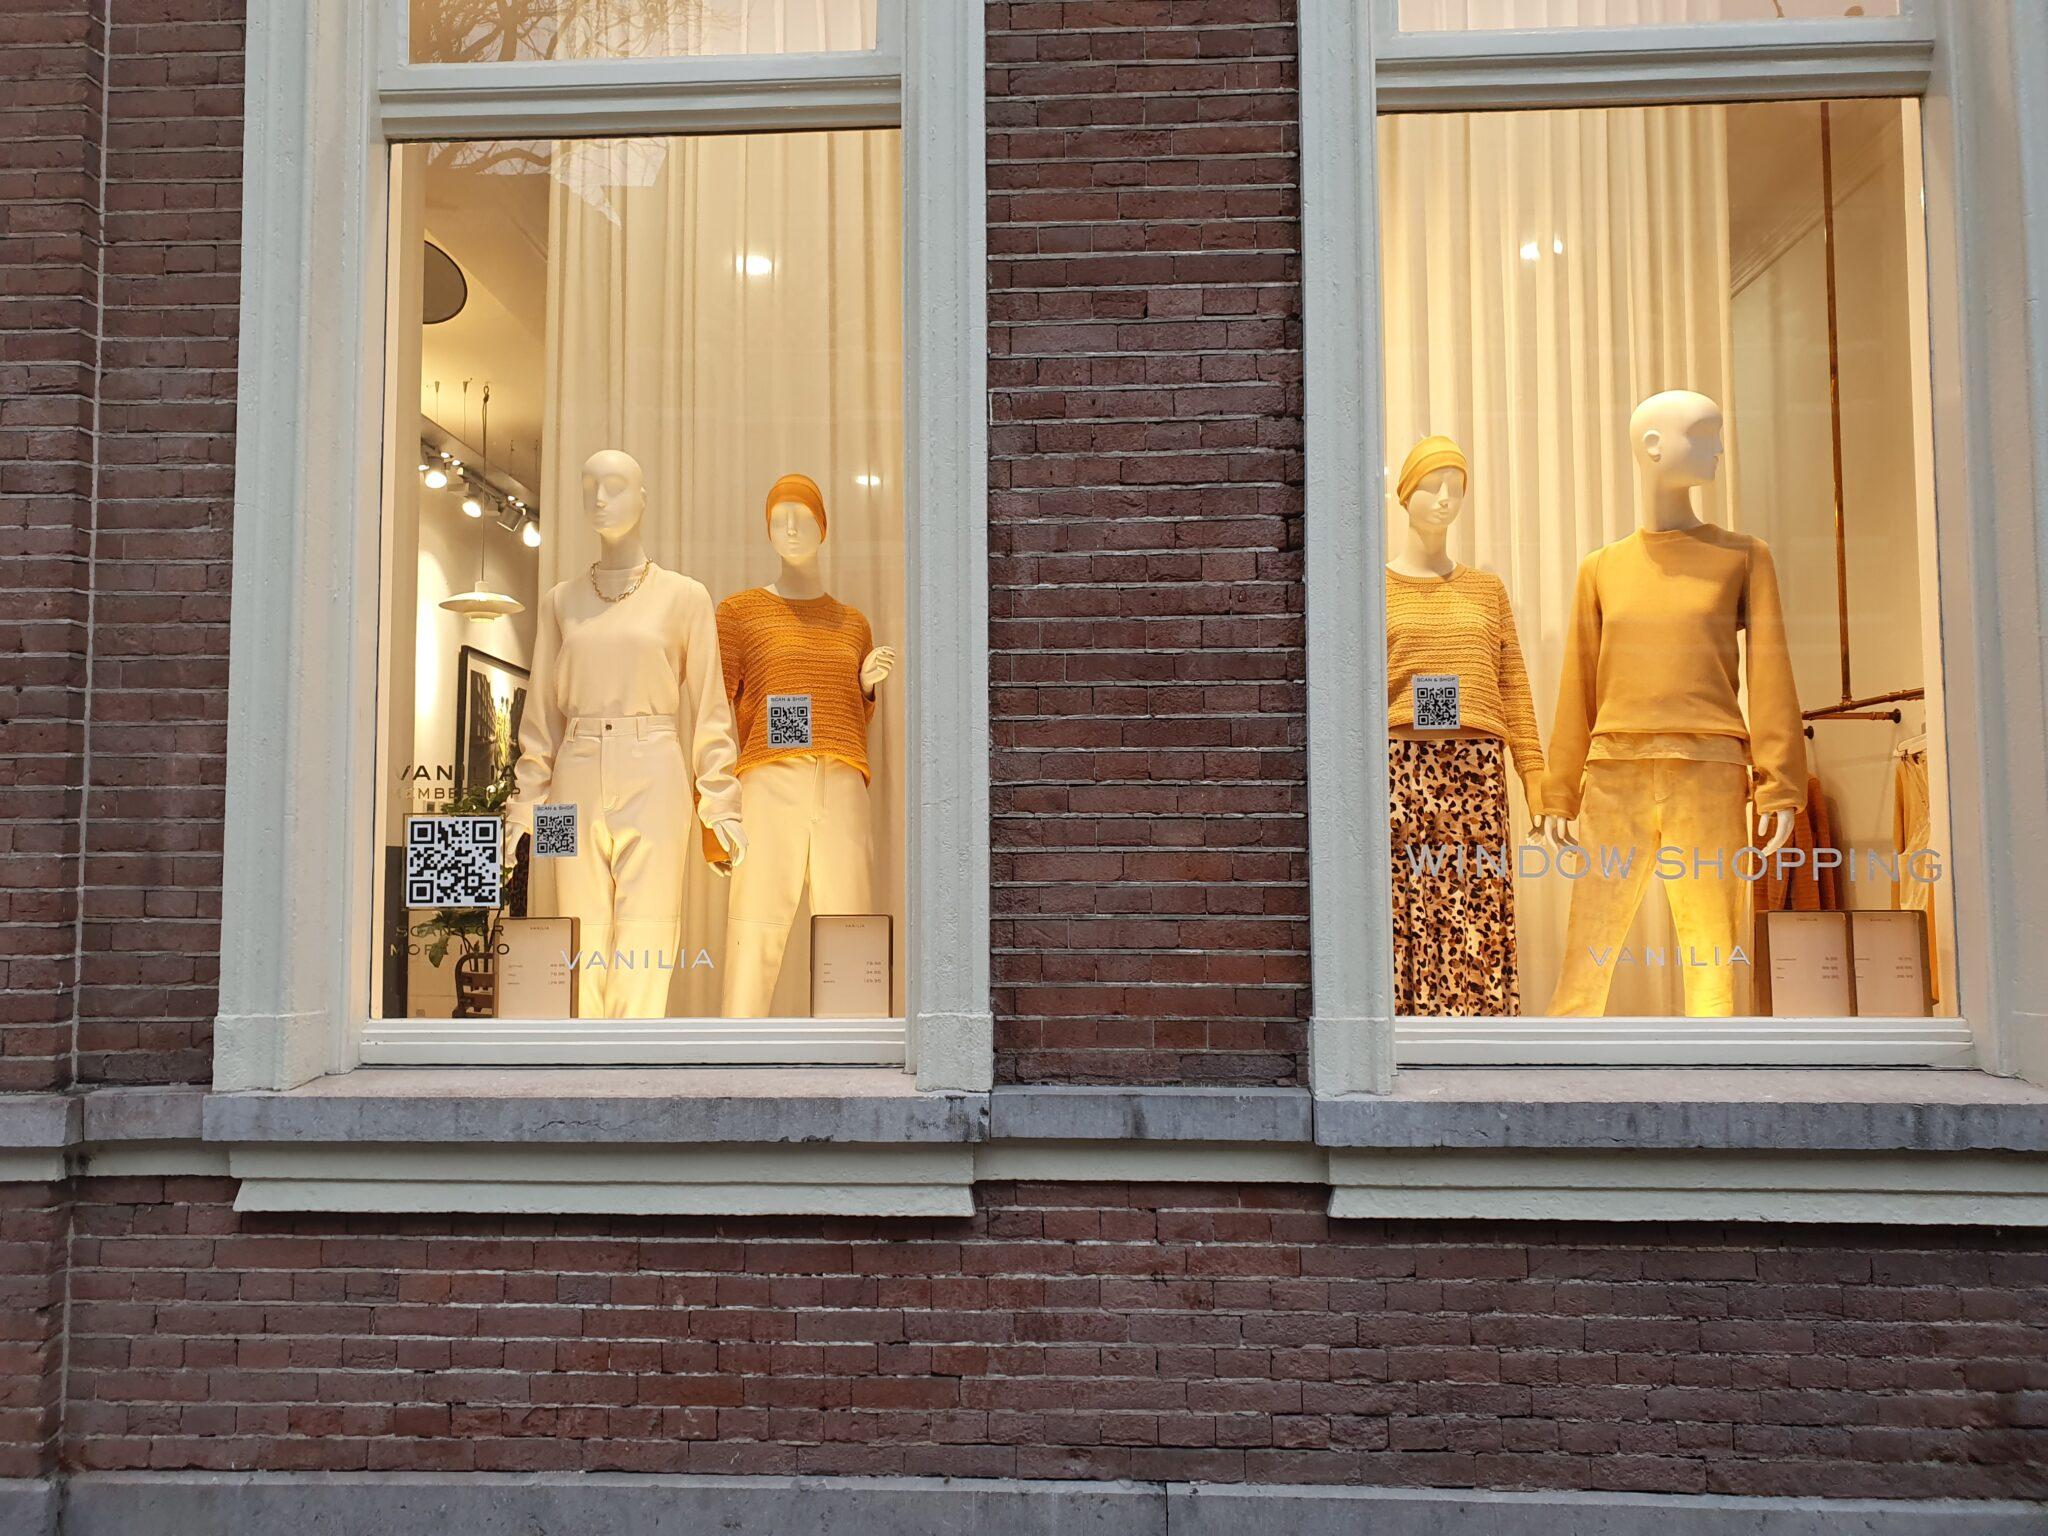 window shoppen etalage